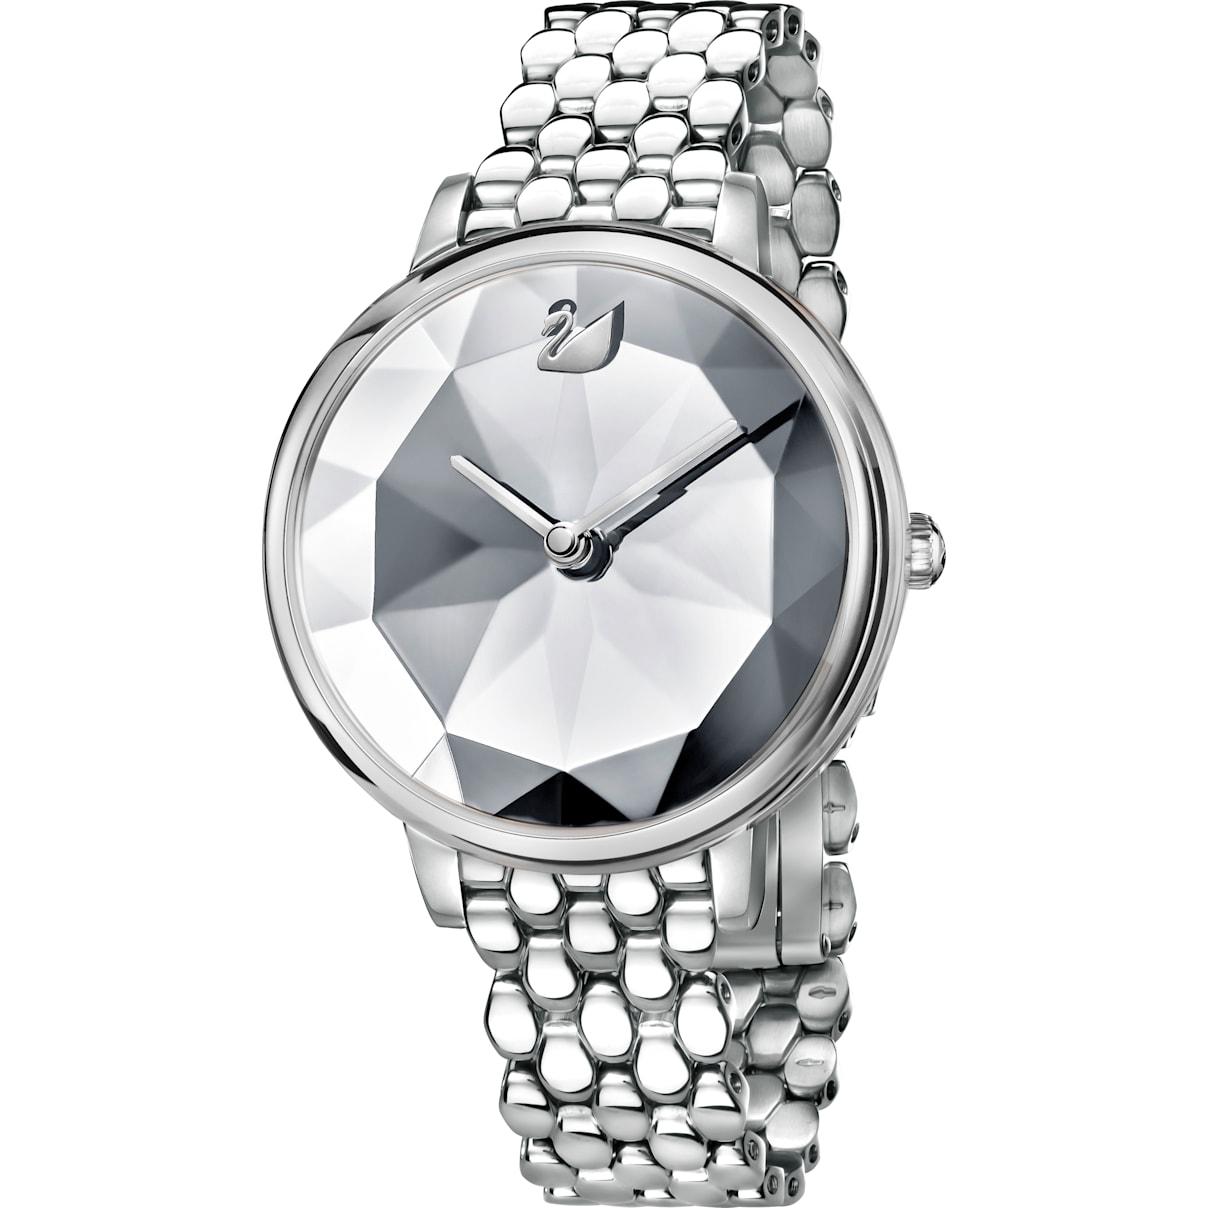 Swarovski Crystal Lake Watch, Metal bracelet, White, Stainless steel